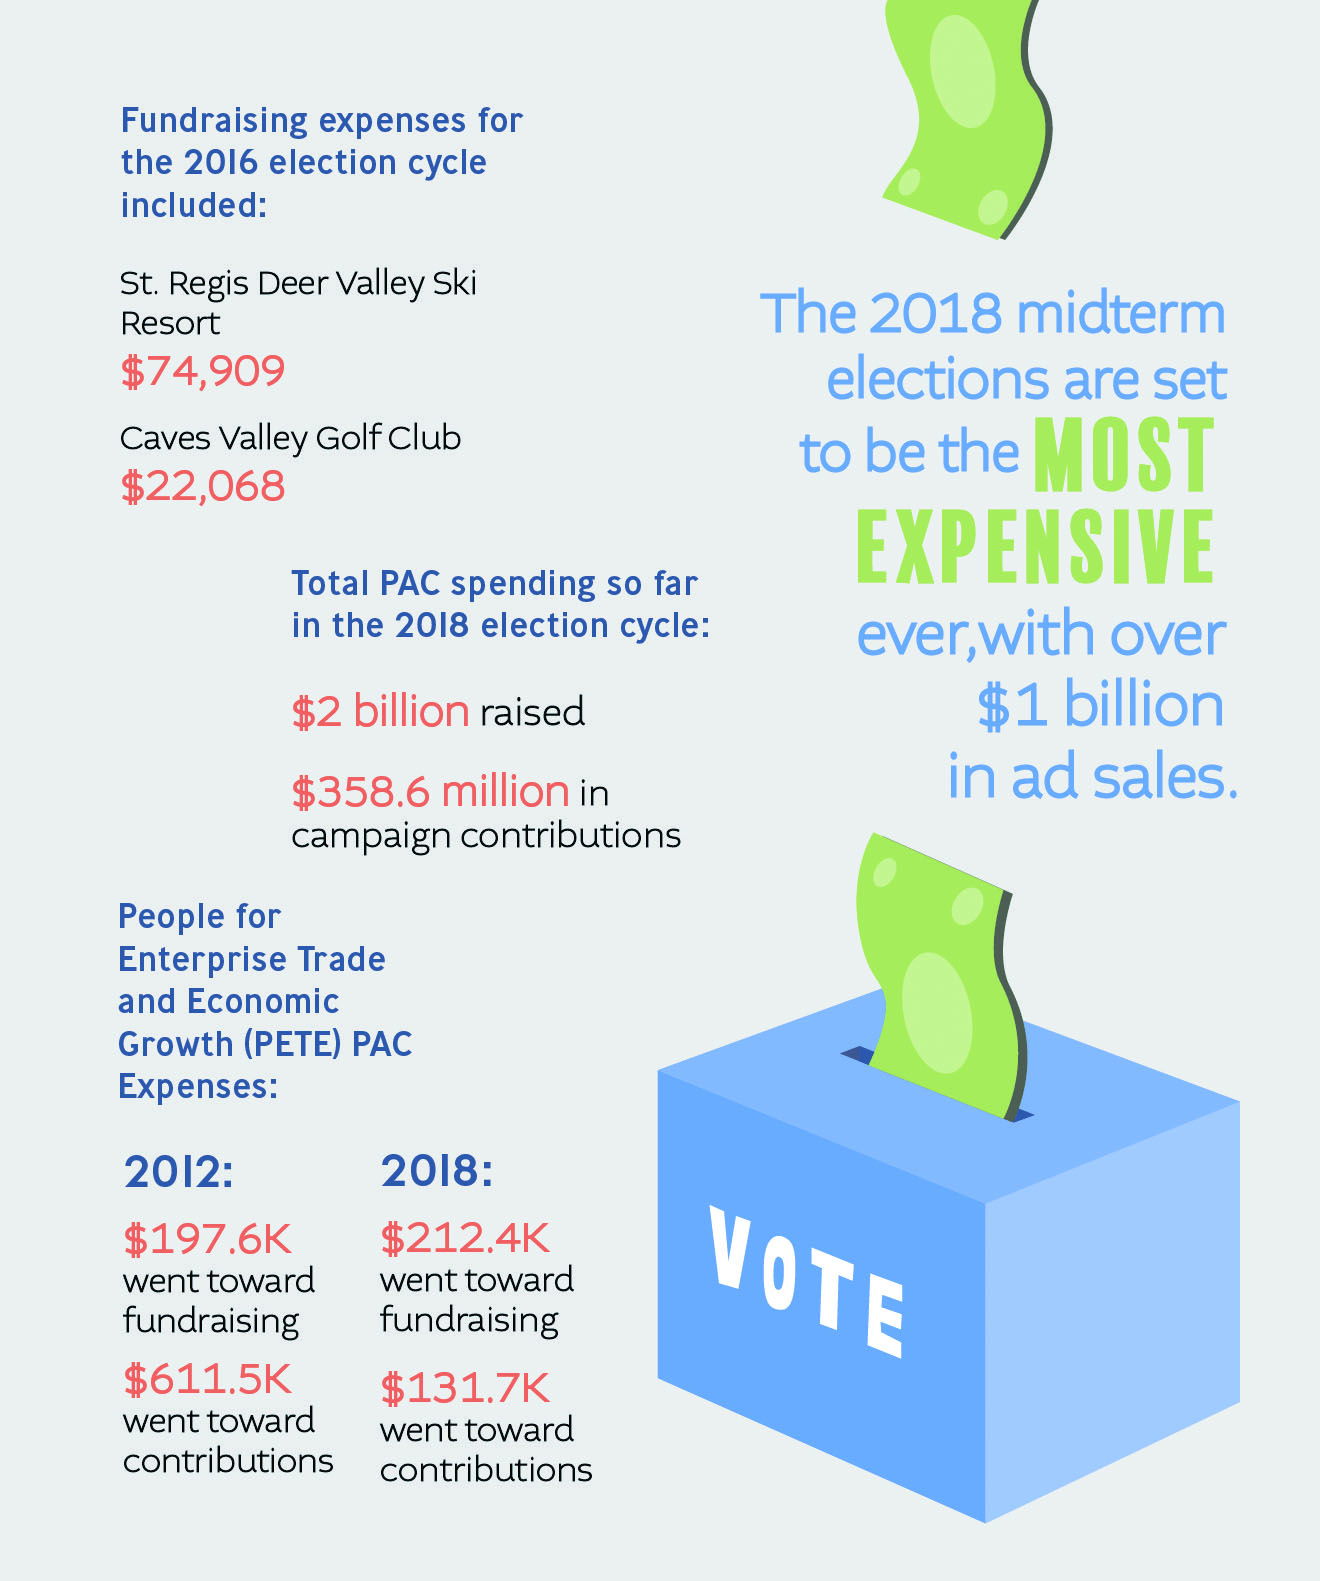 Pete Sessions' campaign finances under scrutiny